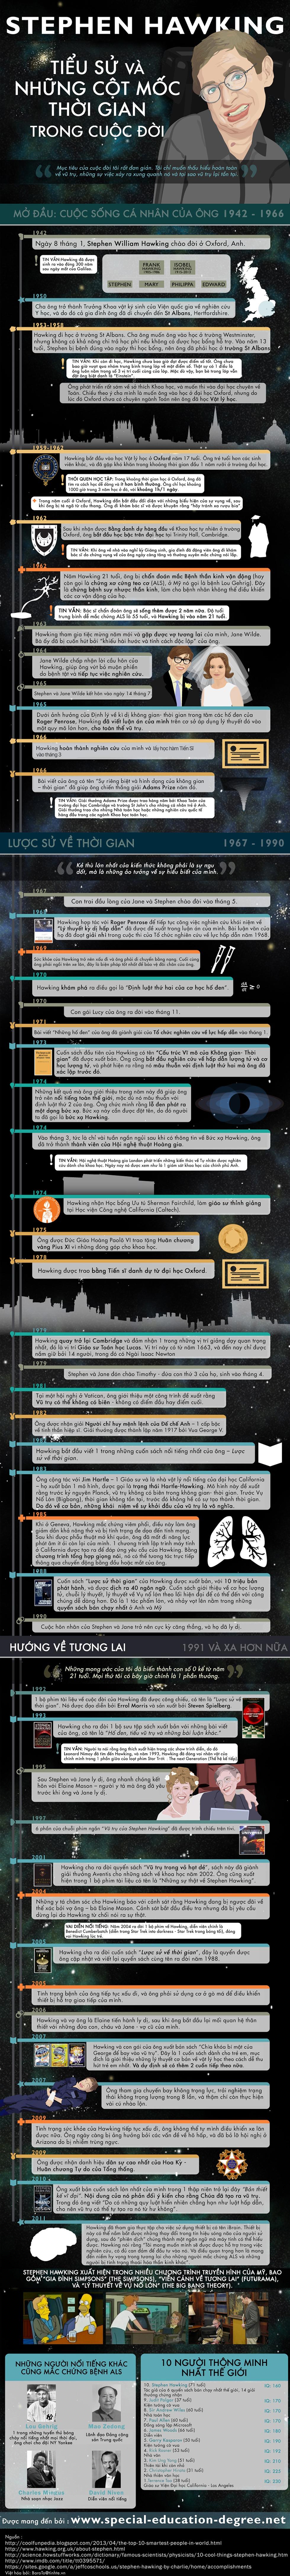 tinhte_Stephen_Hawking_infographic.jpg